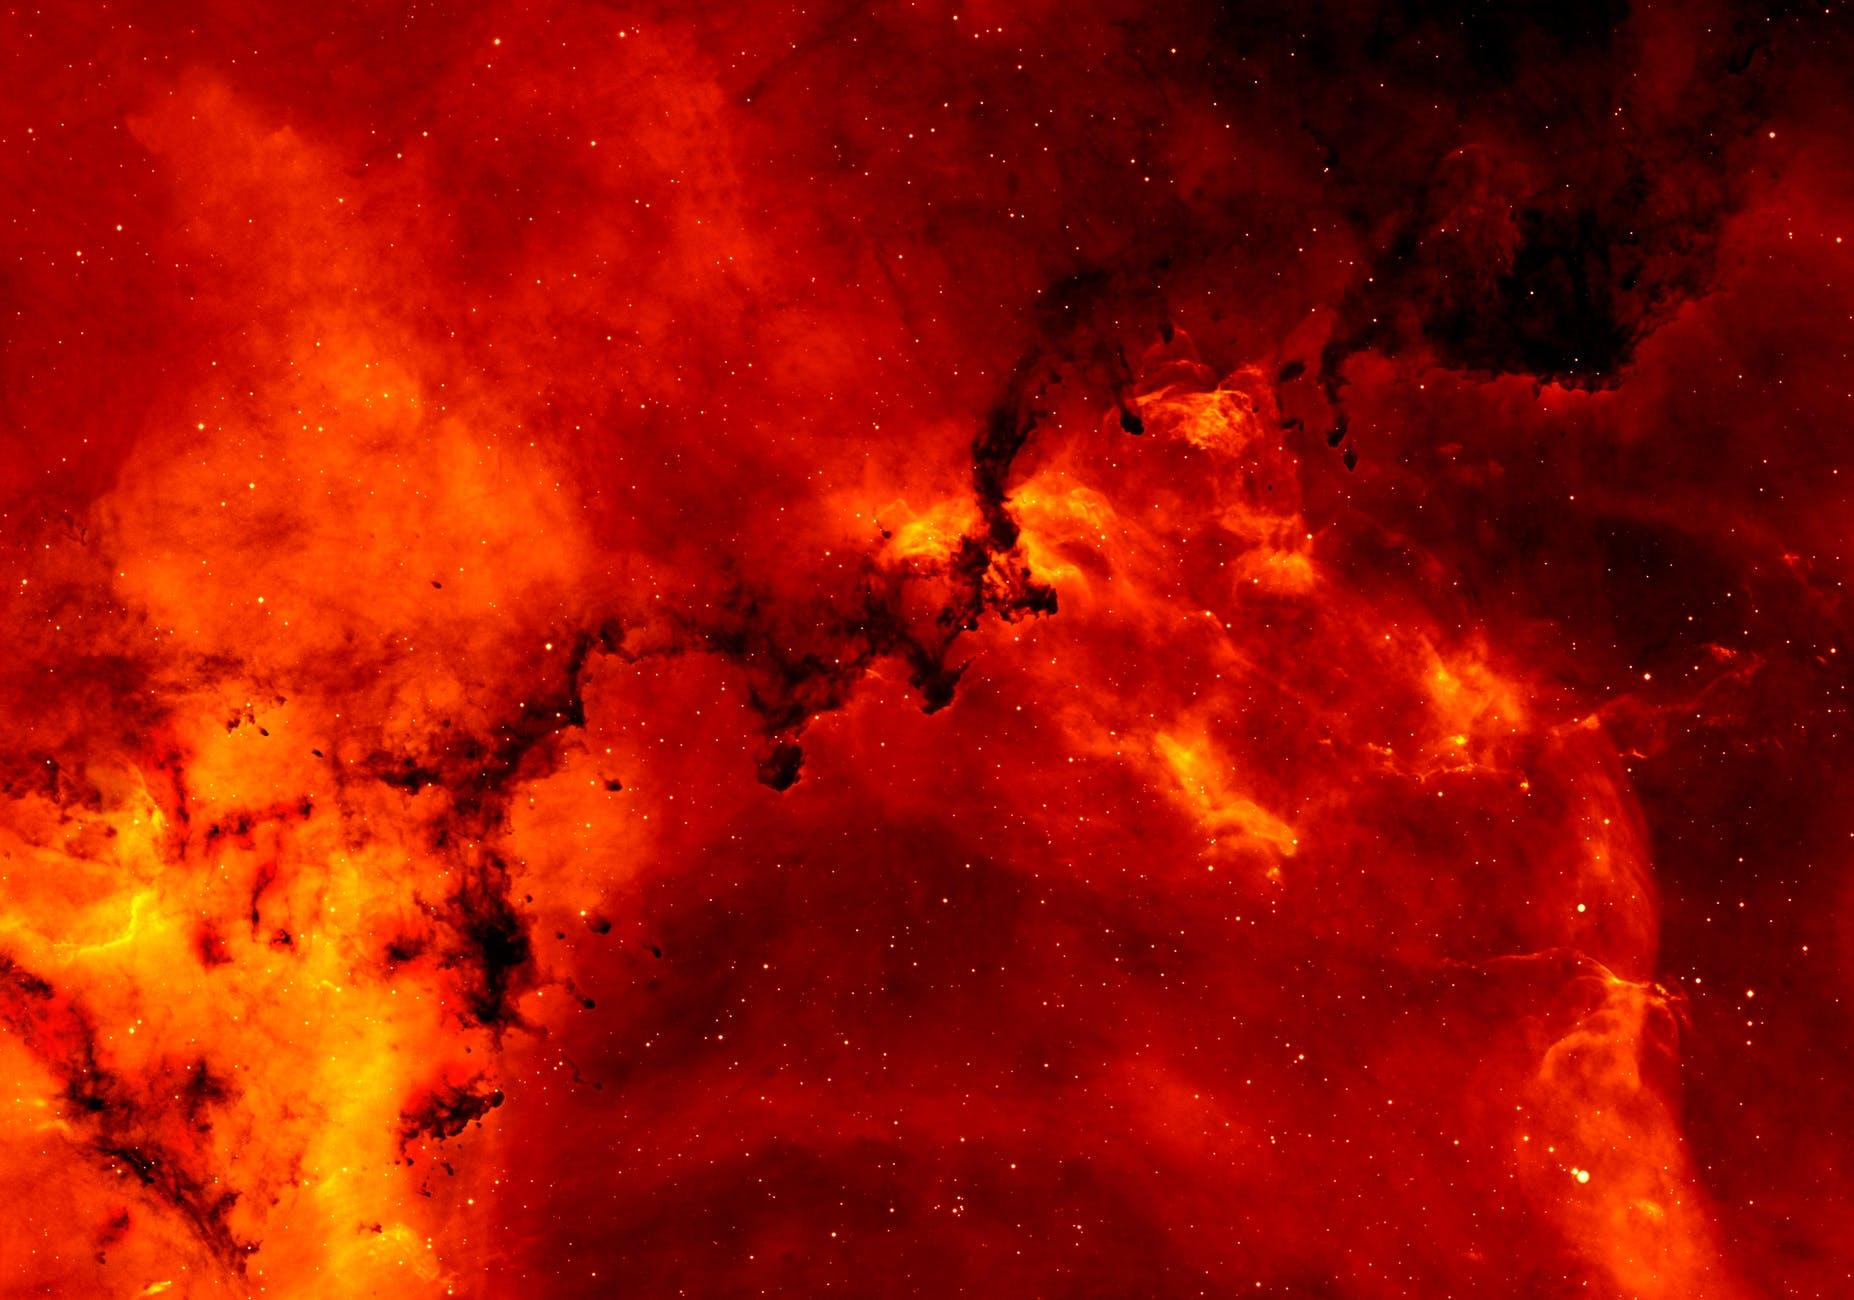 red and orange solar flare